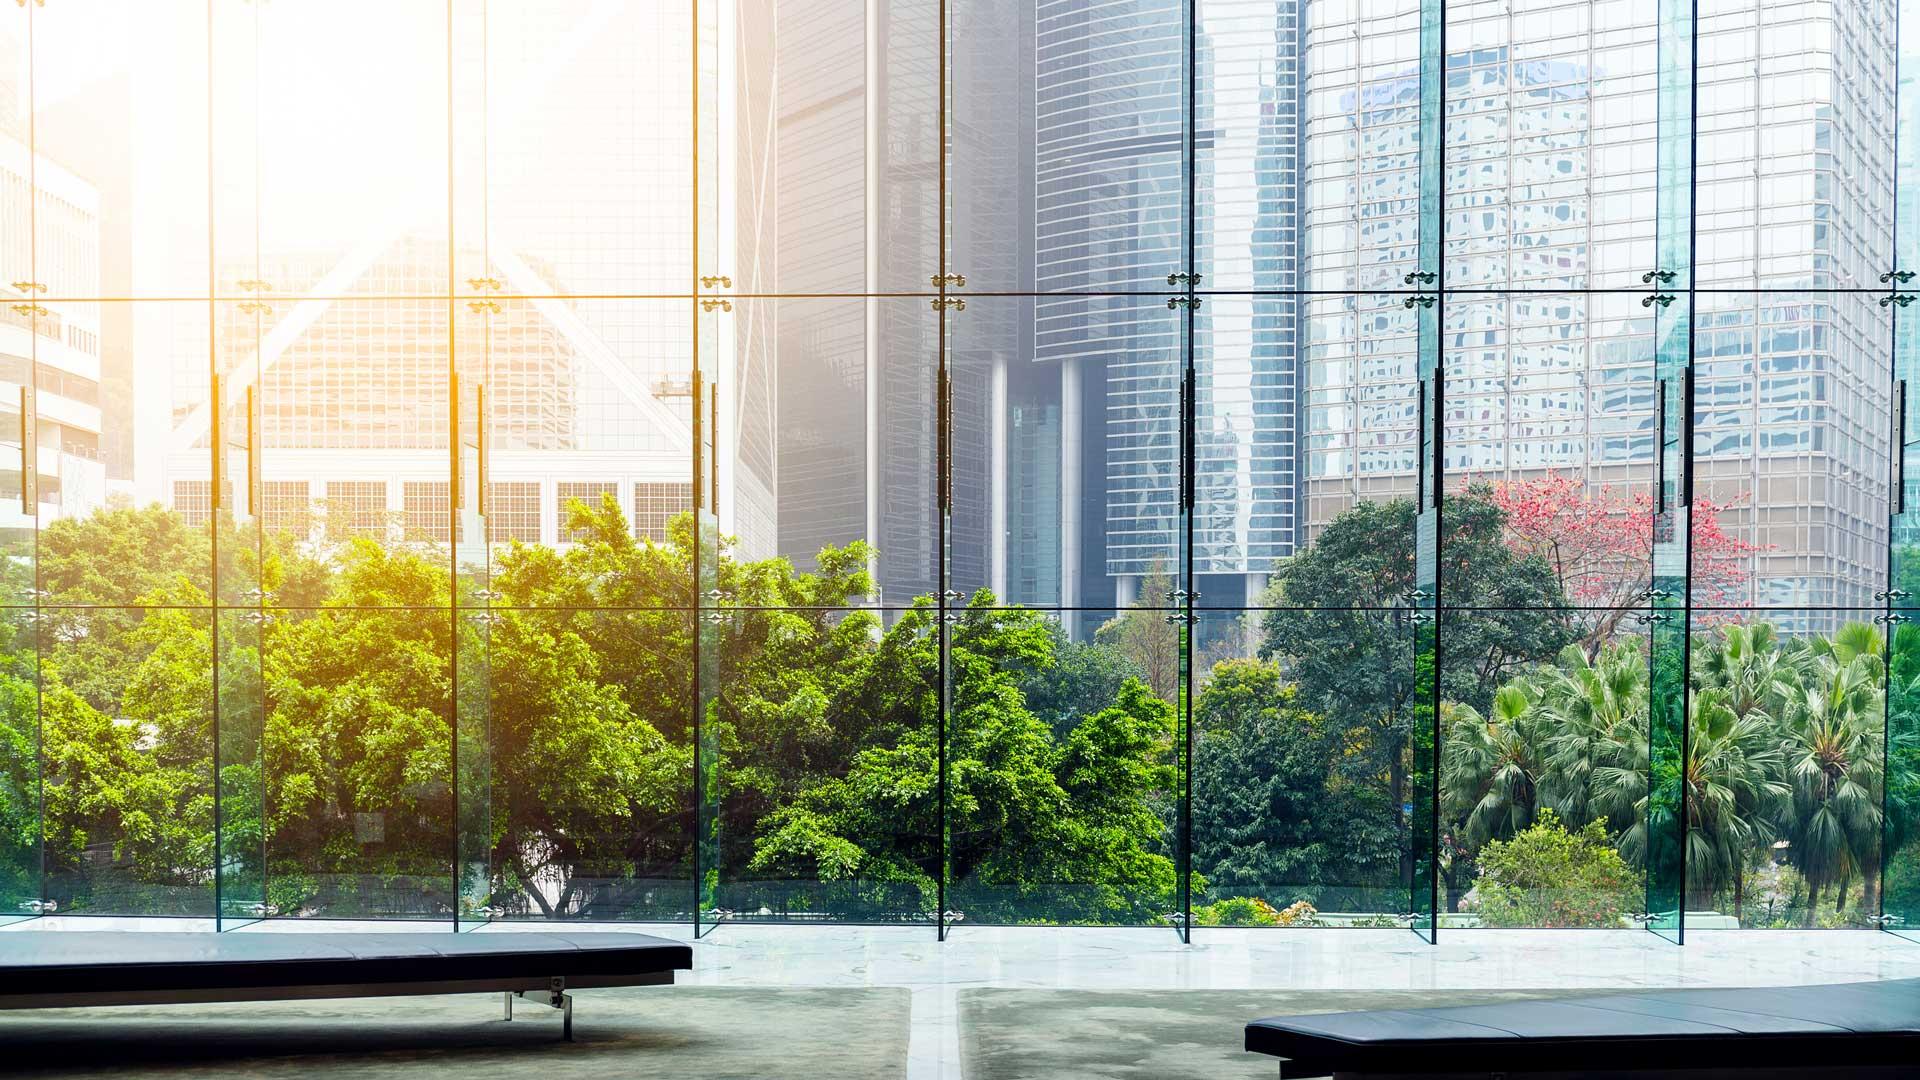 Greenery between the office buildings